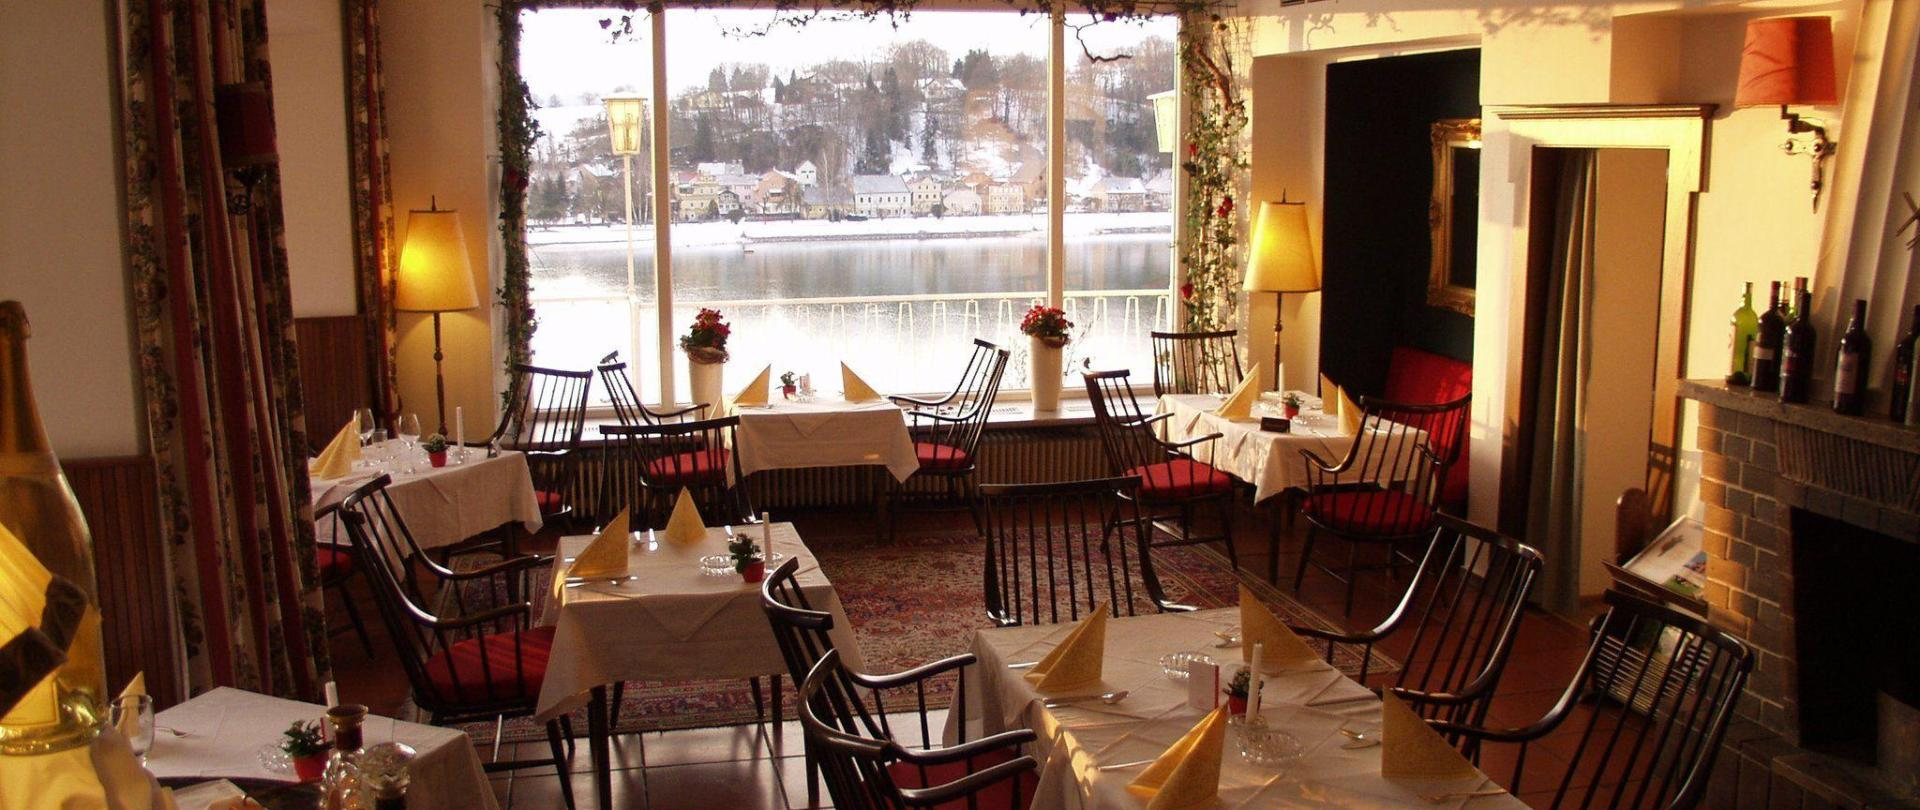 restaurant-top-1.jpg